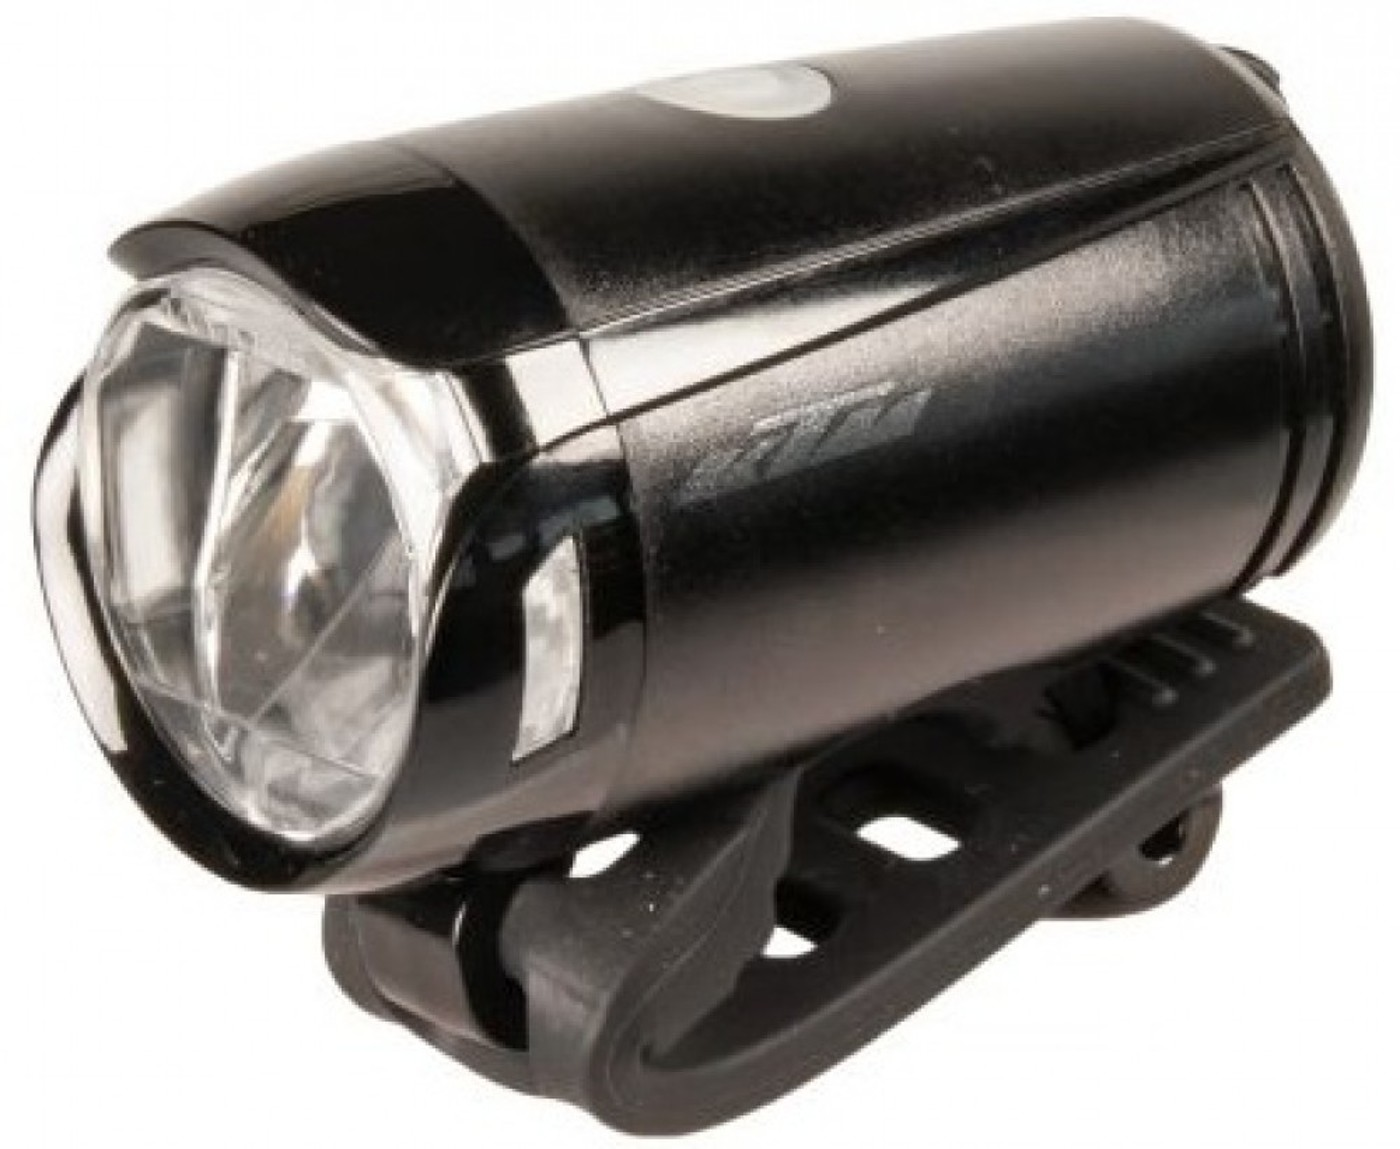 KTM LED 25 LUX USB K-MARK